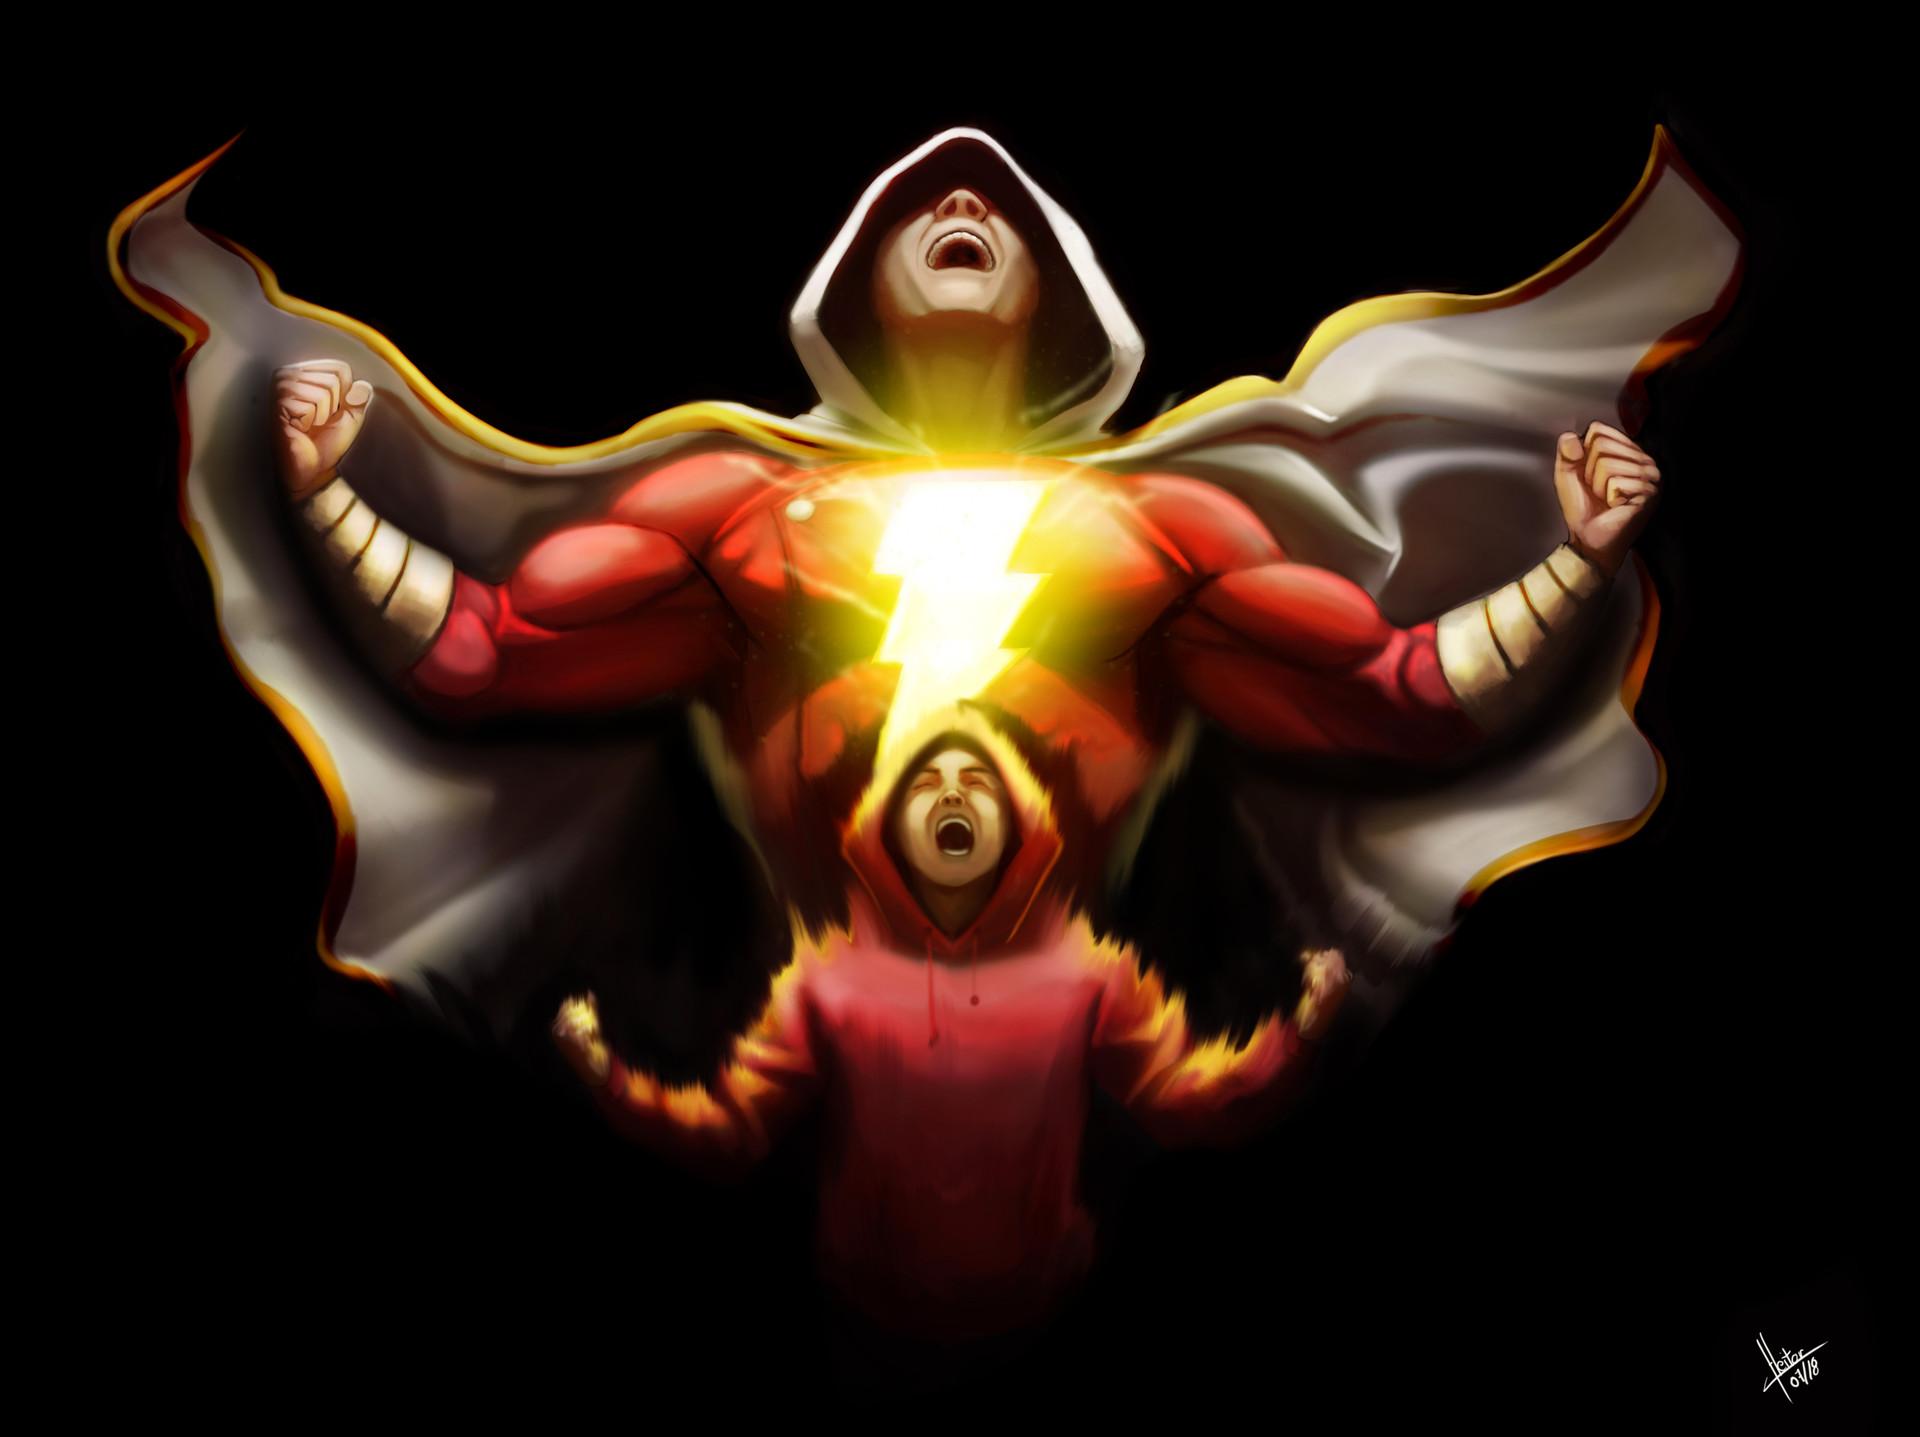 Shazam Transform Hd Superheroes 4k Wallpapers Images Backgrounds